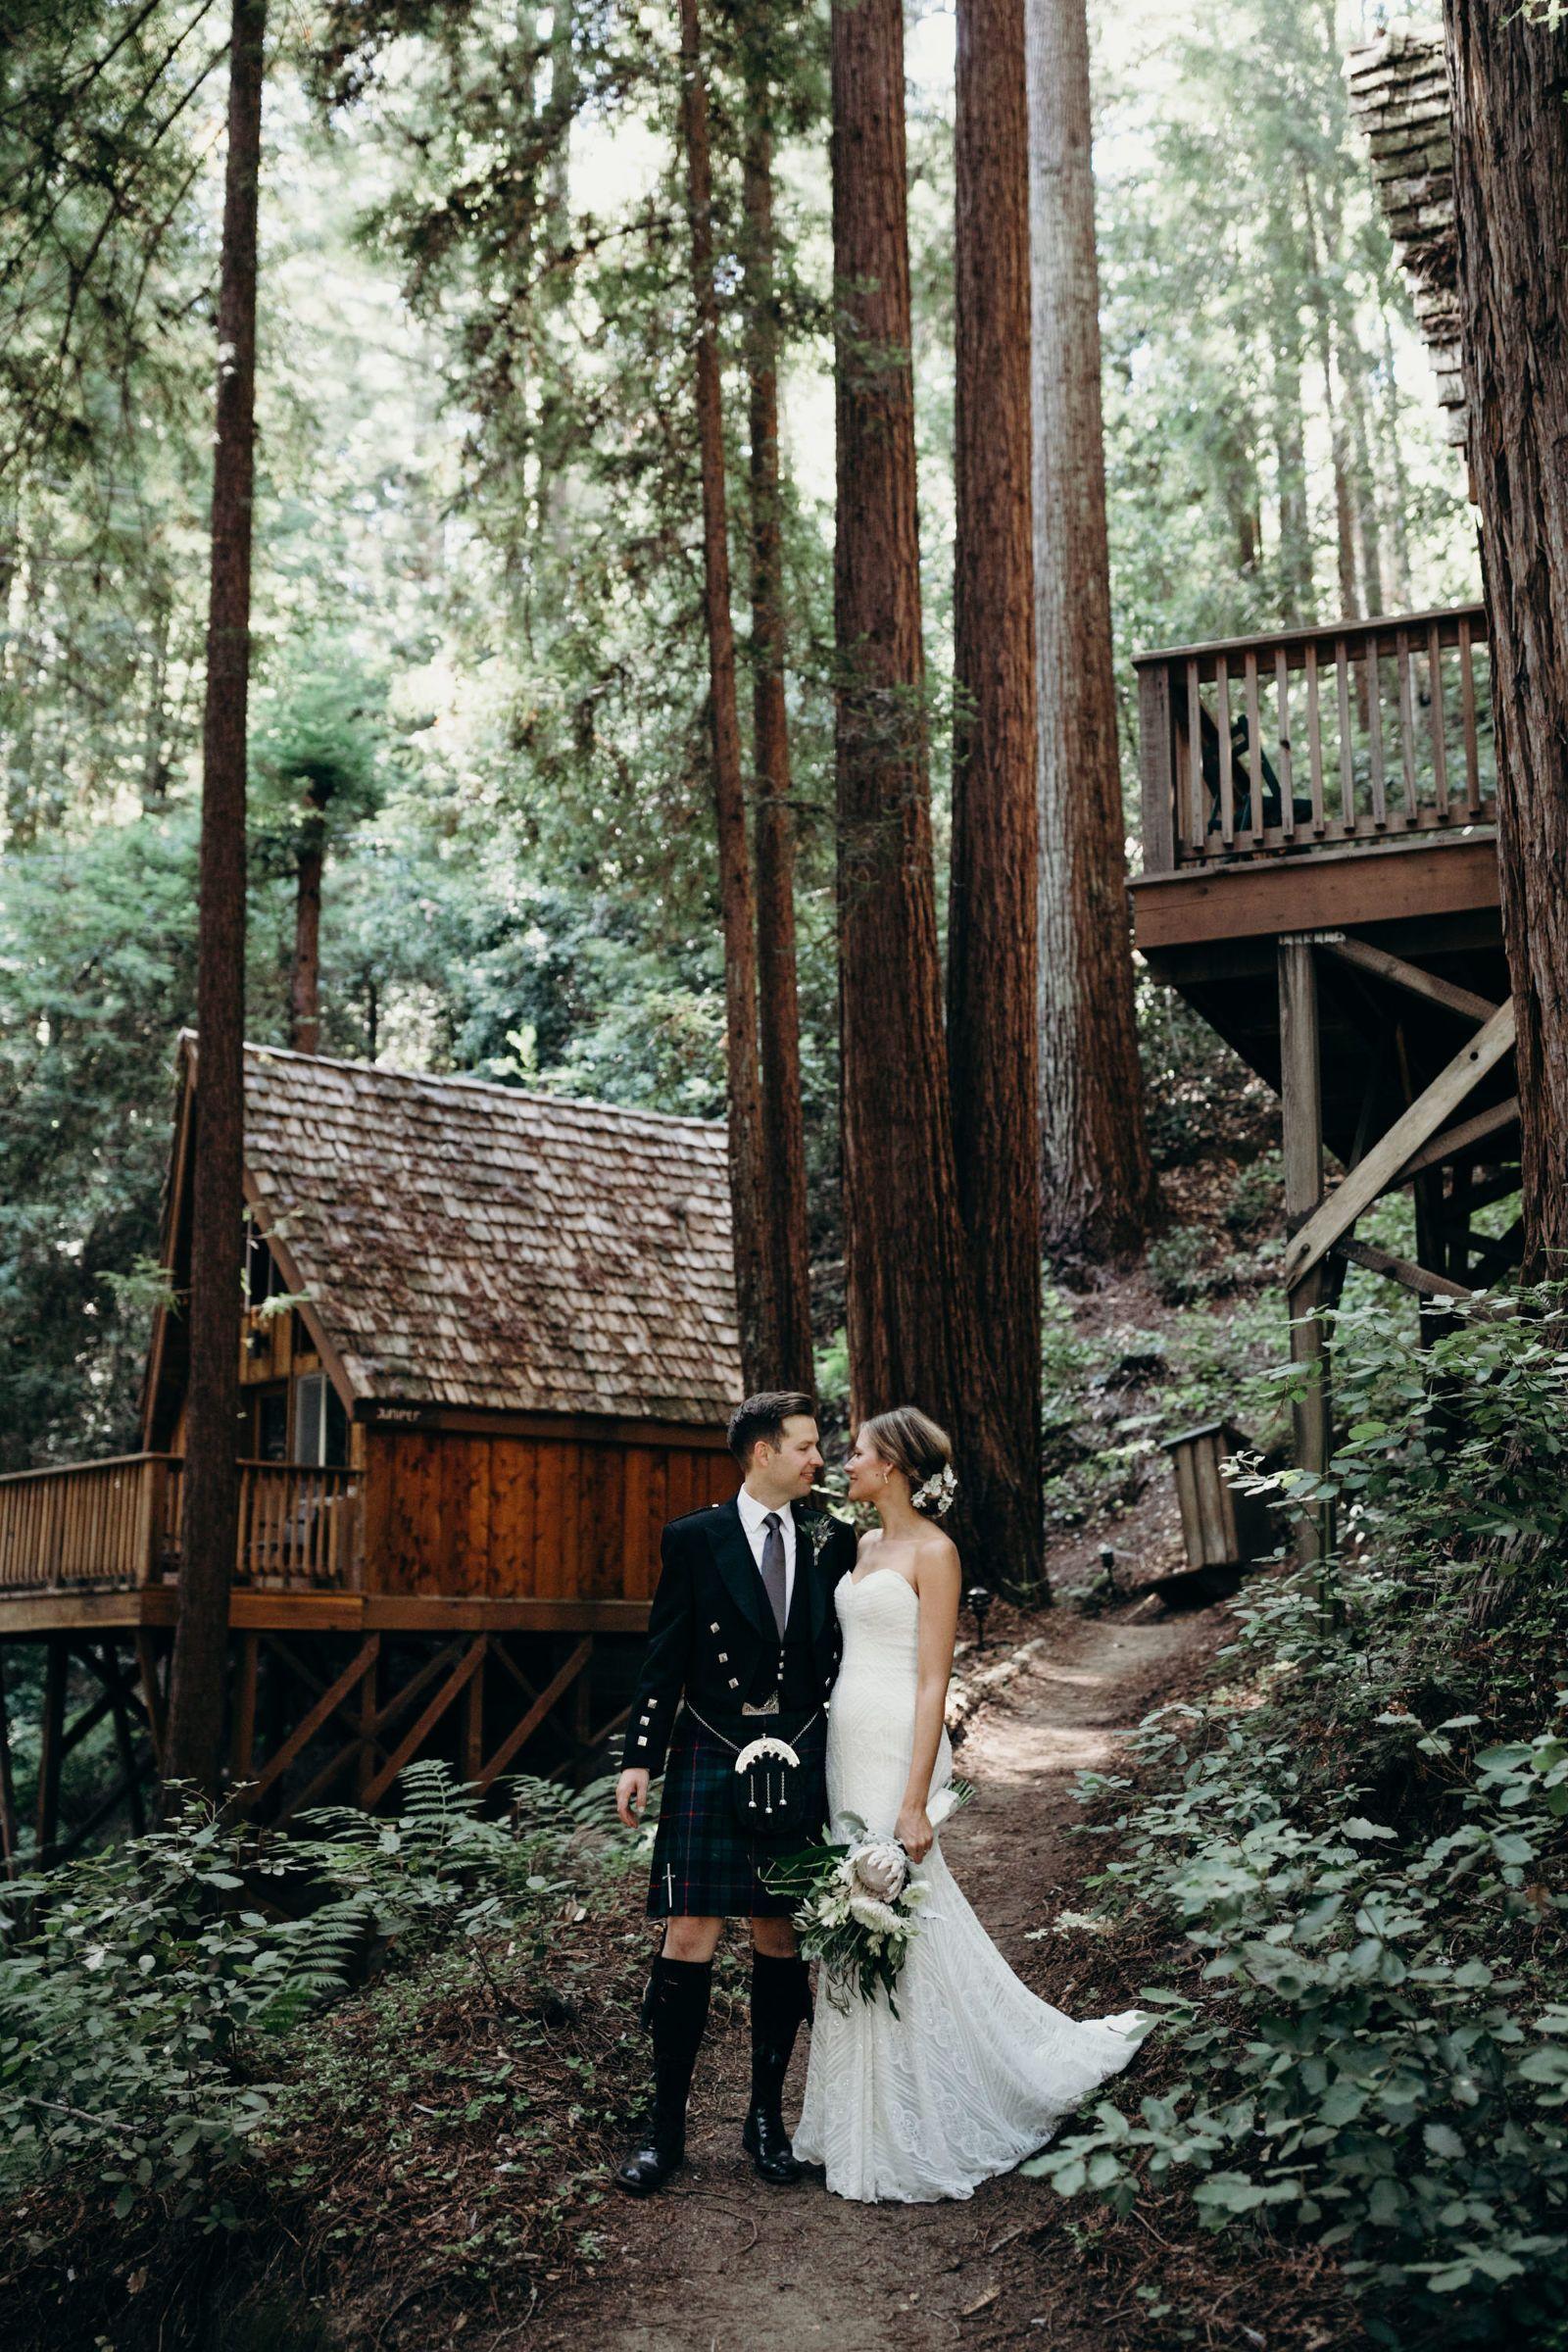 Best Redwood Forest Wedding Venues in California | Wedding ...